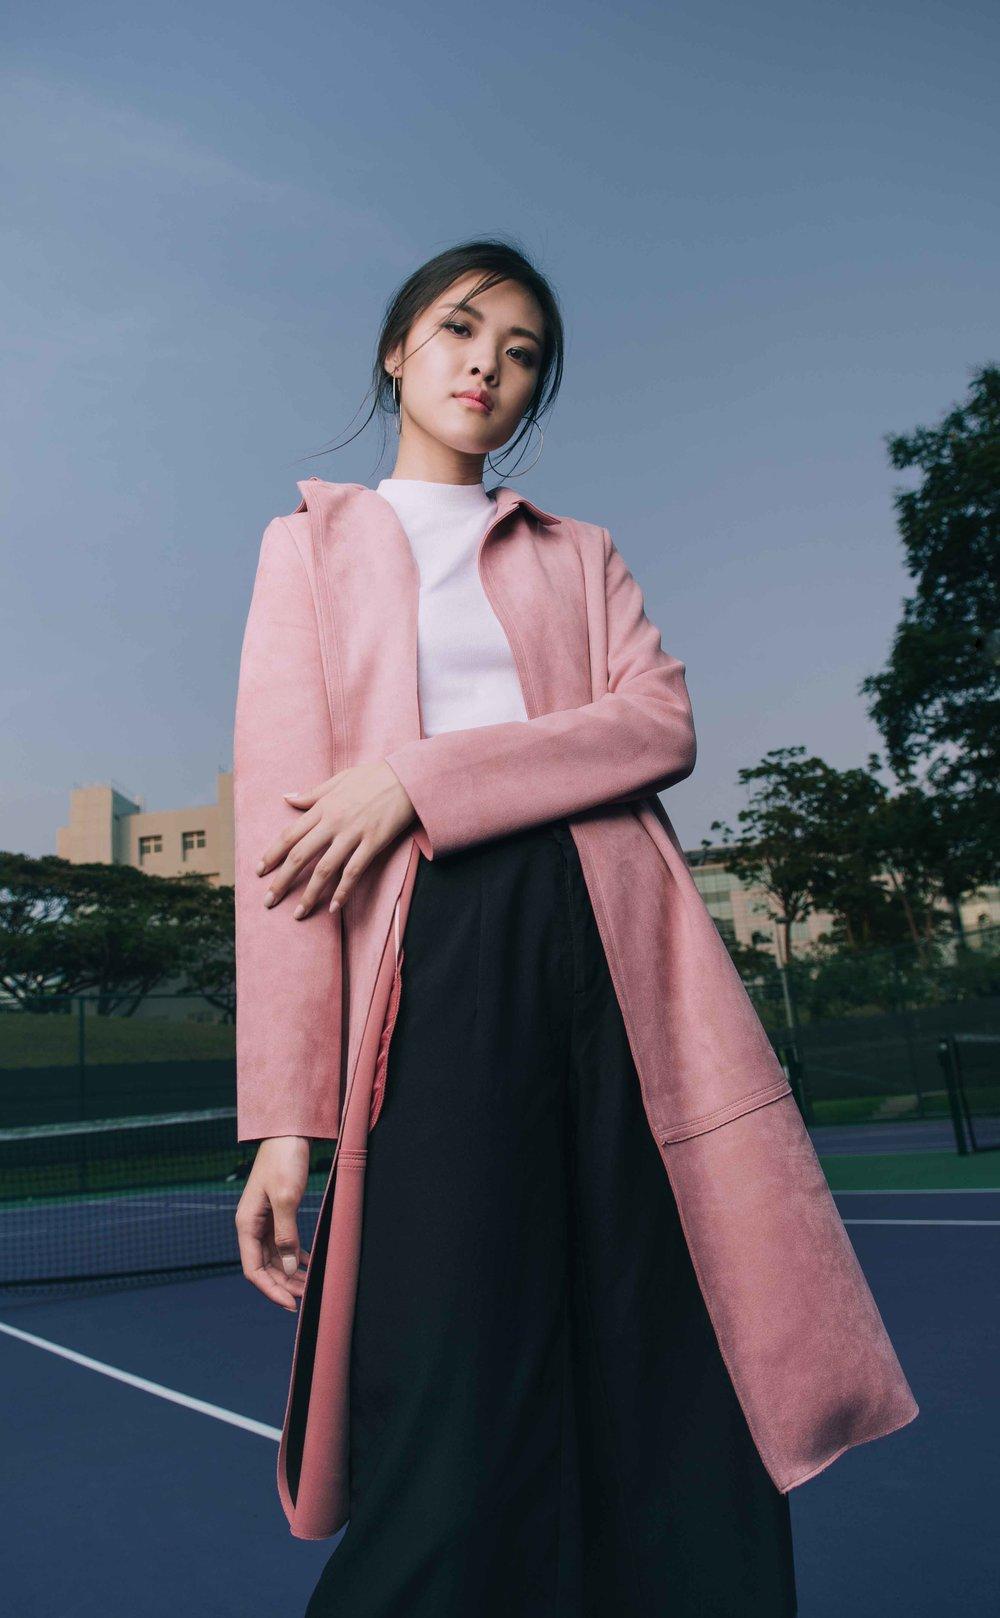 Pink Coat on Purple Court #1